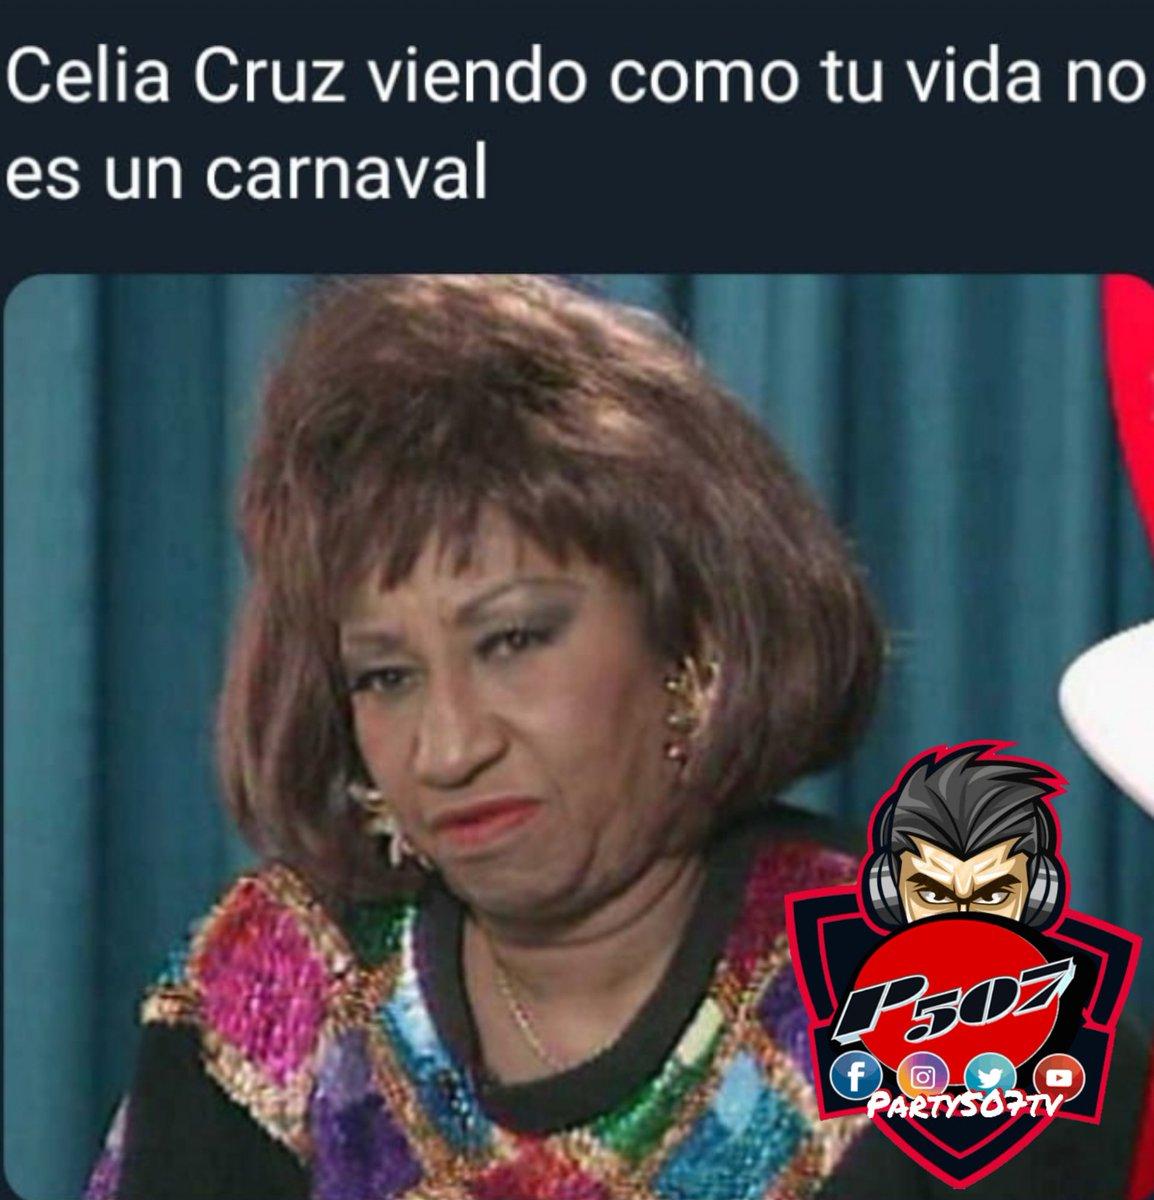 #party507tv #memes #humor #humornegro #humoramarillo #humorista #humorgrafico #risa #risas #videosderisas #videosgraciosos #videoviral #risasaseguradas #risascontagiosas #risasymasrisas #graciosopic.twitter.com/voiYeWF7xd